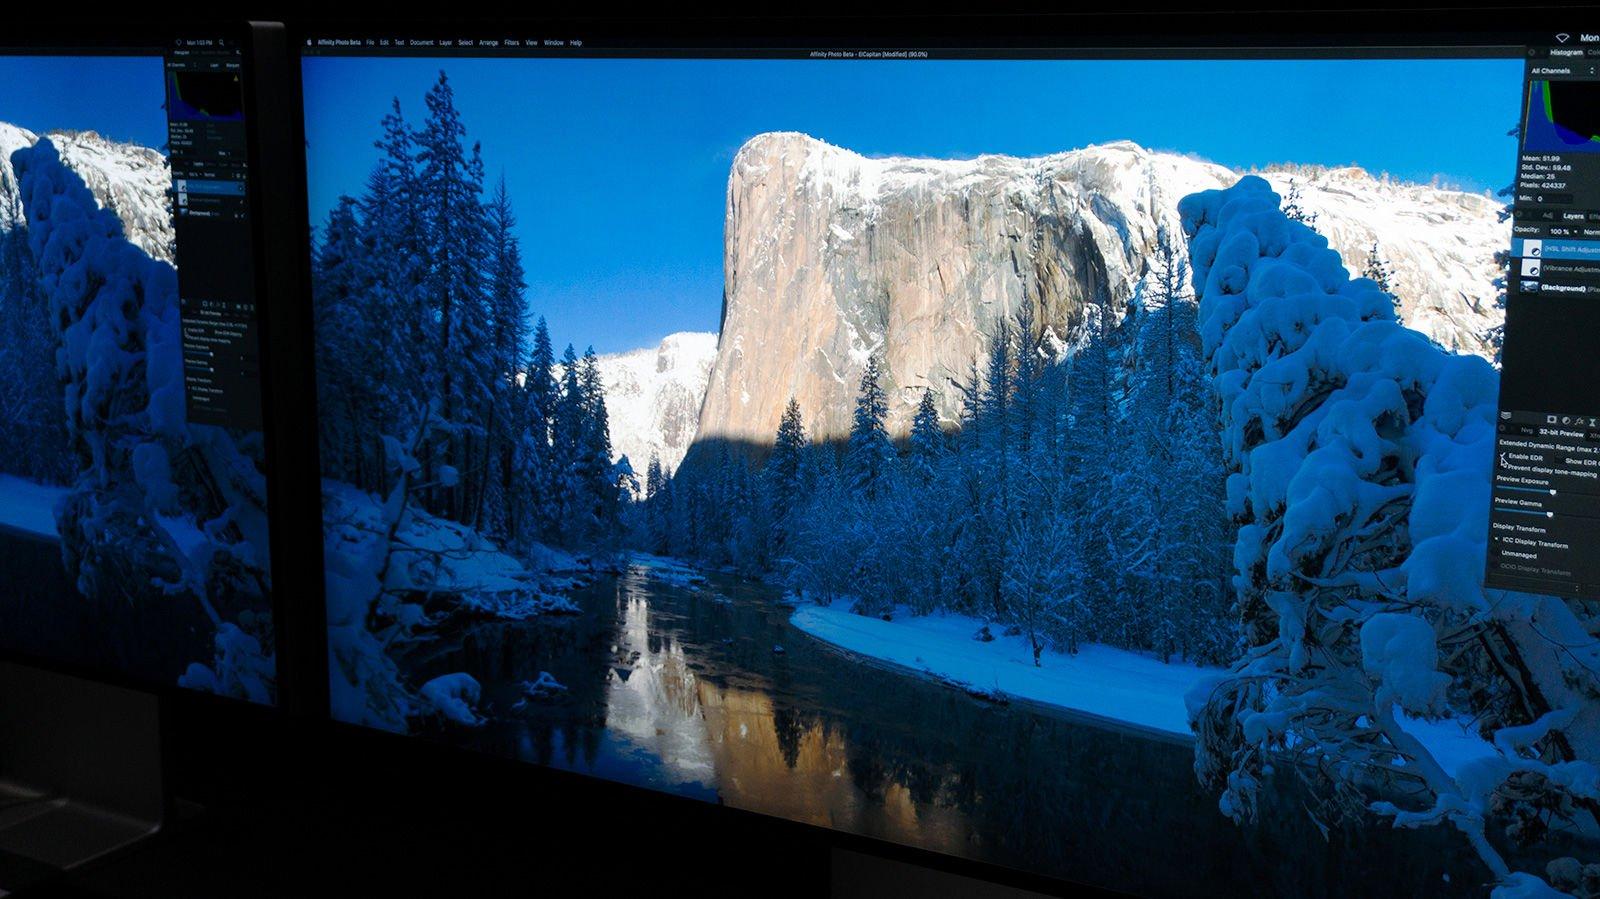 Apple Pro Display XDR: utilizando EDR